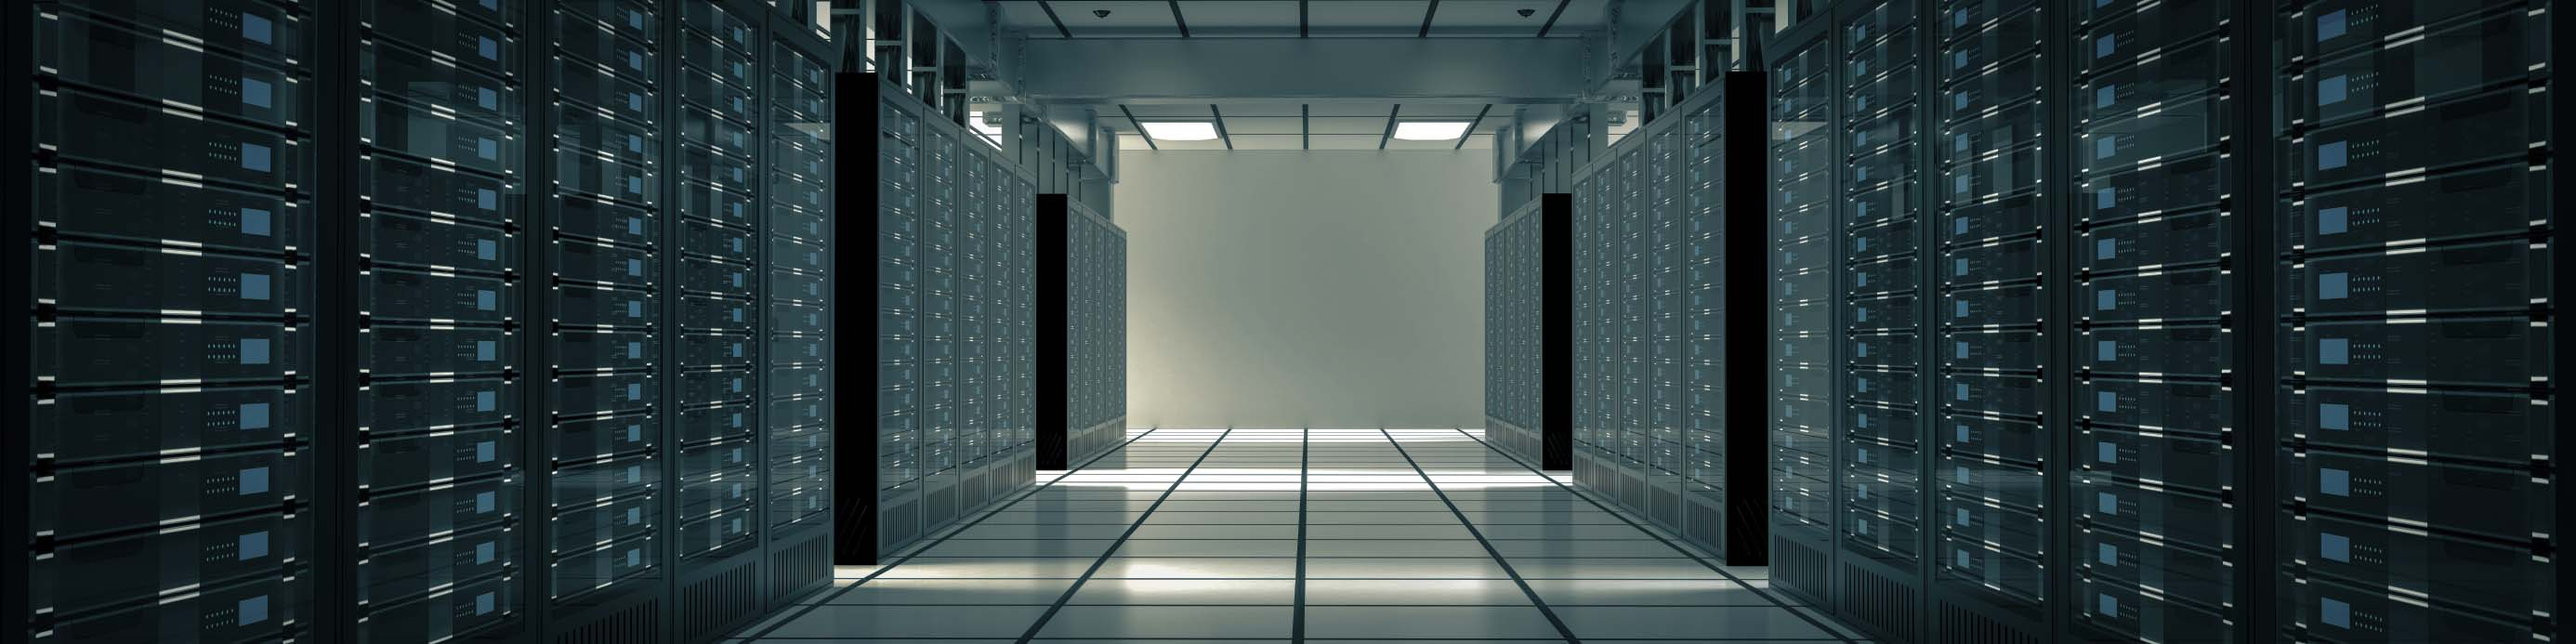 datacentre3.jpg